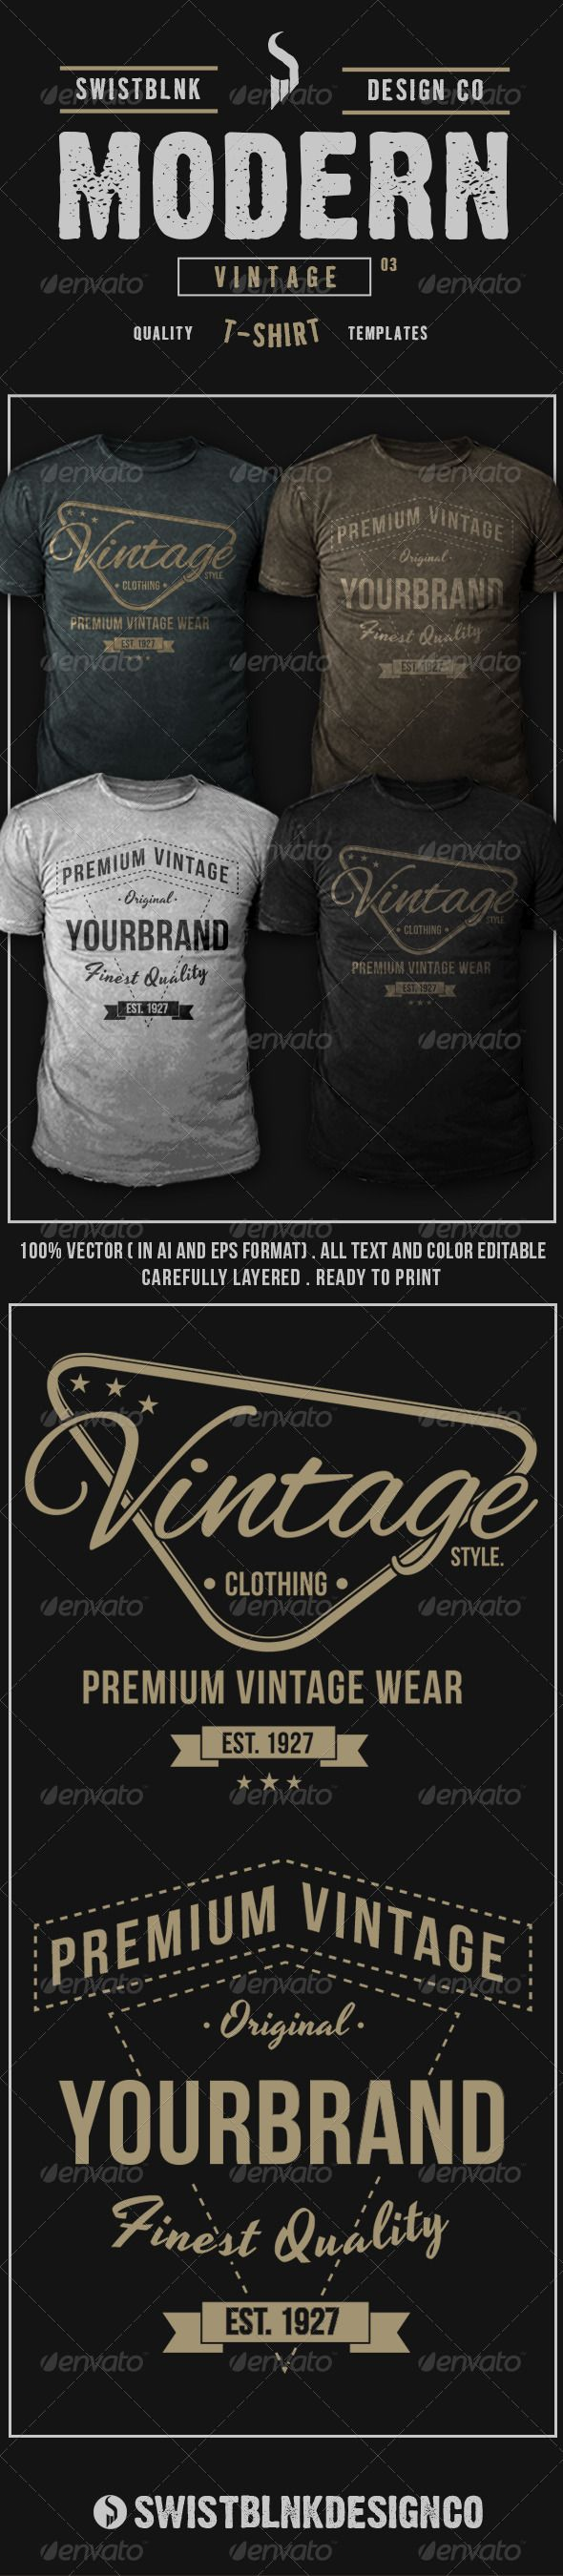 Modern Vintage T-Shirt Template Vector EPS, AI. Download here: http://graphicriver.net/item/modern-vintage-tshirt-03/6655954?ref=ksioks